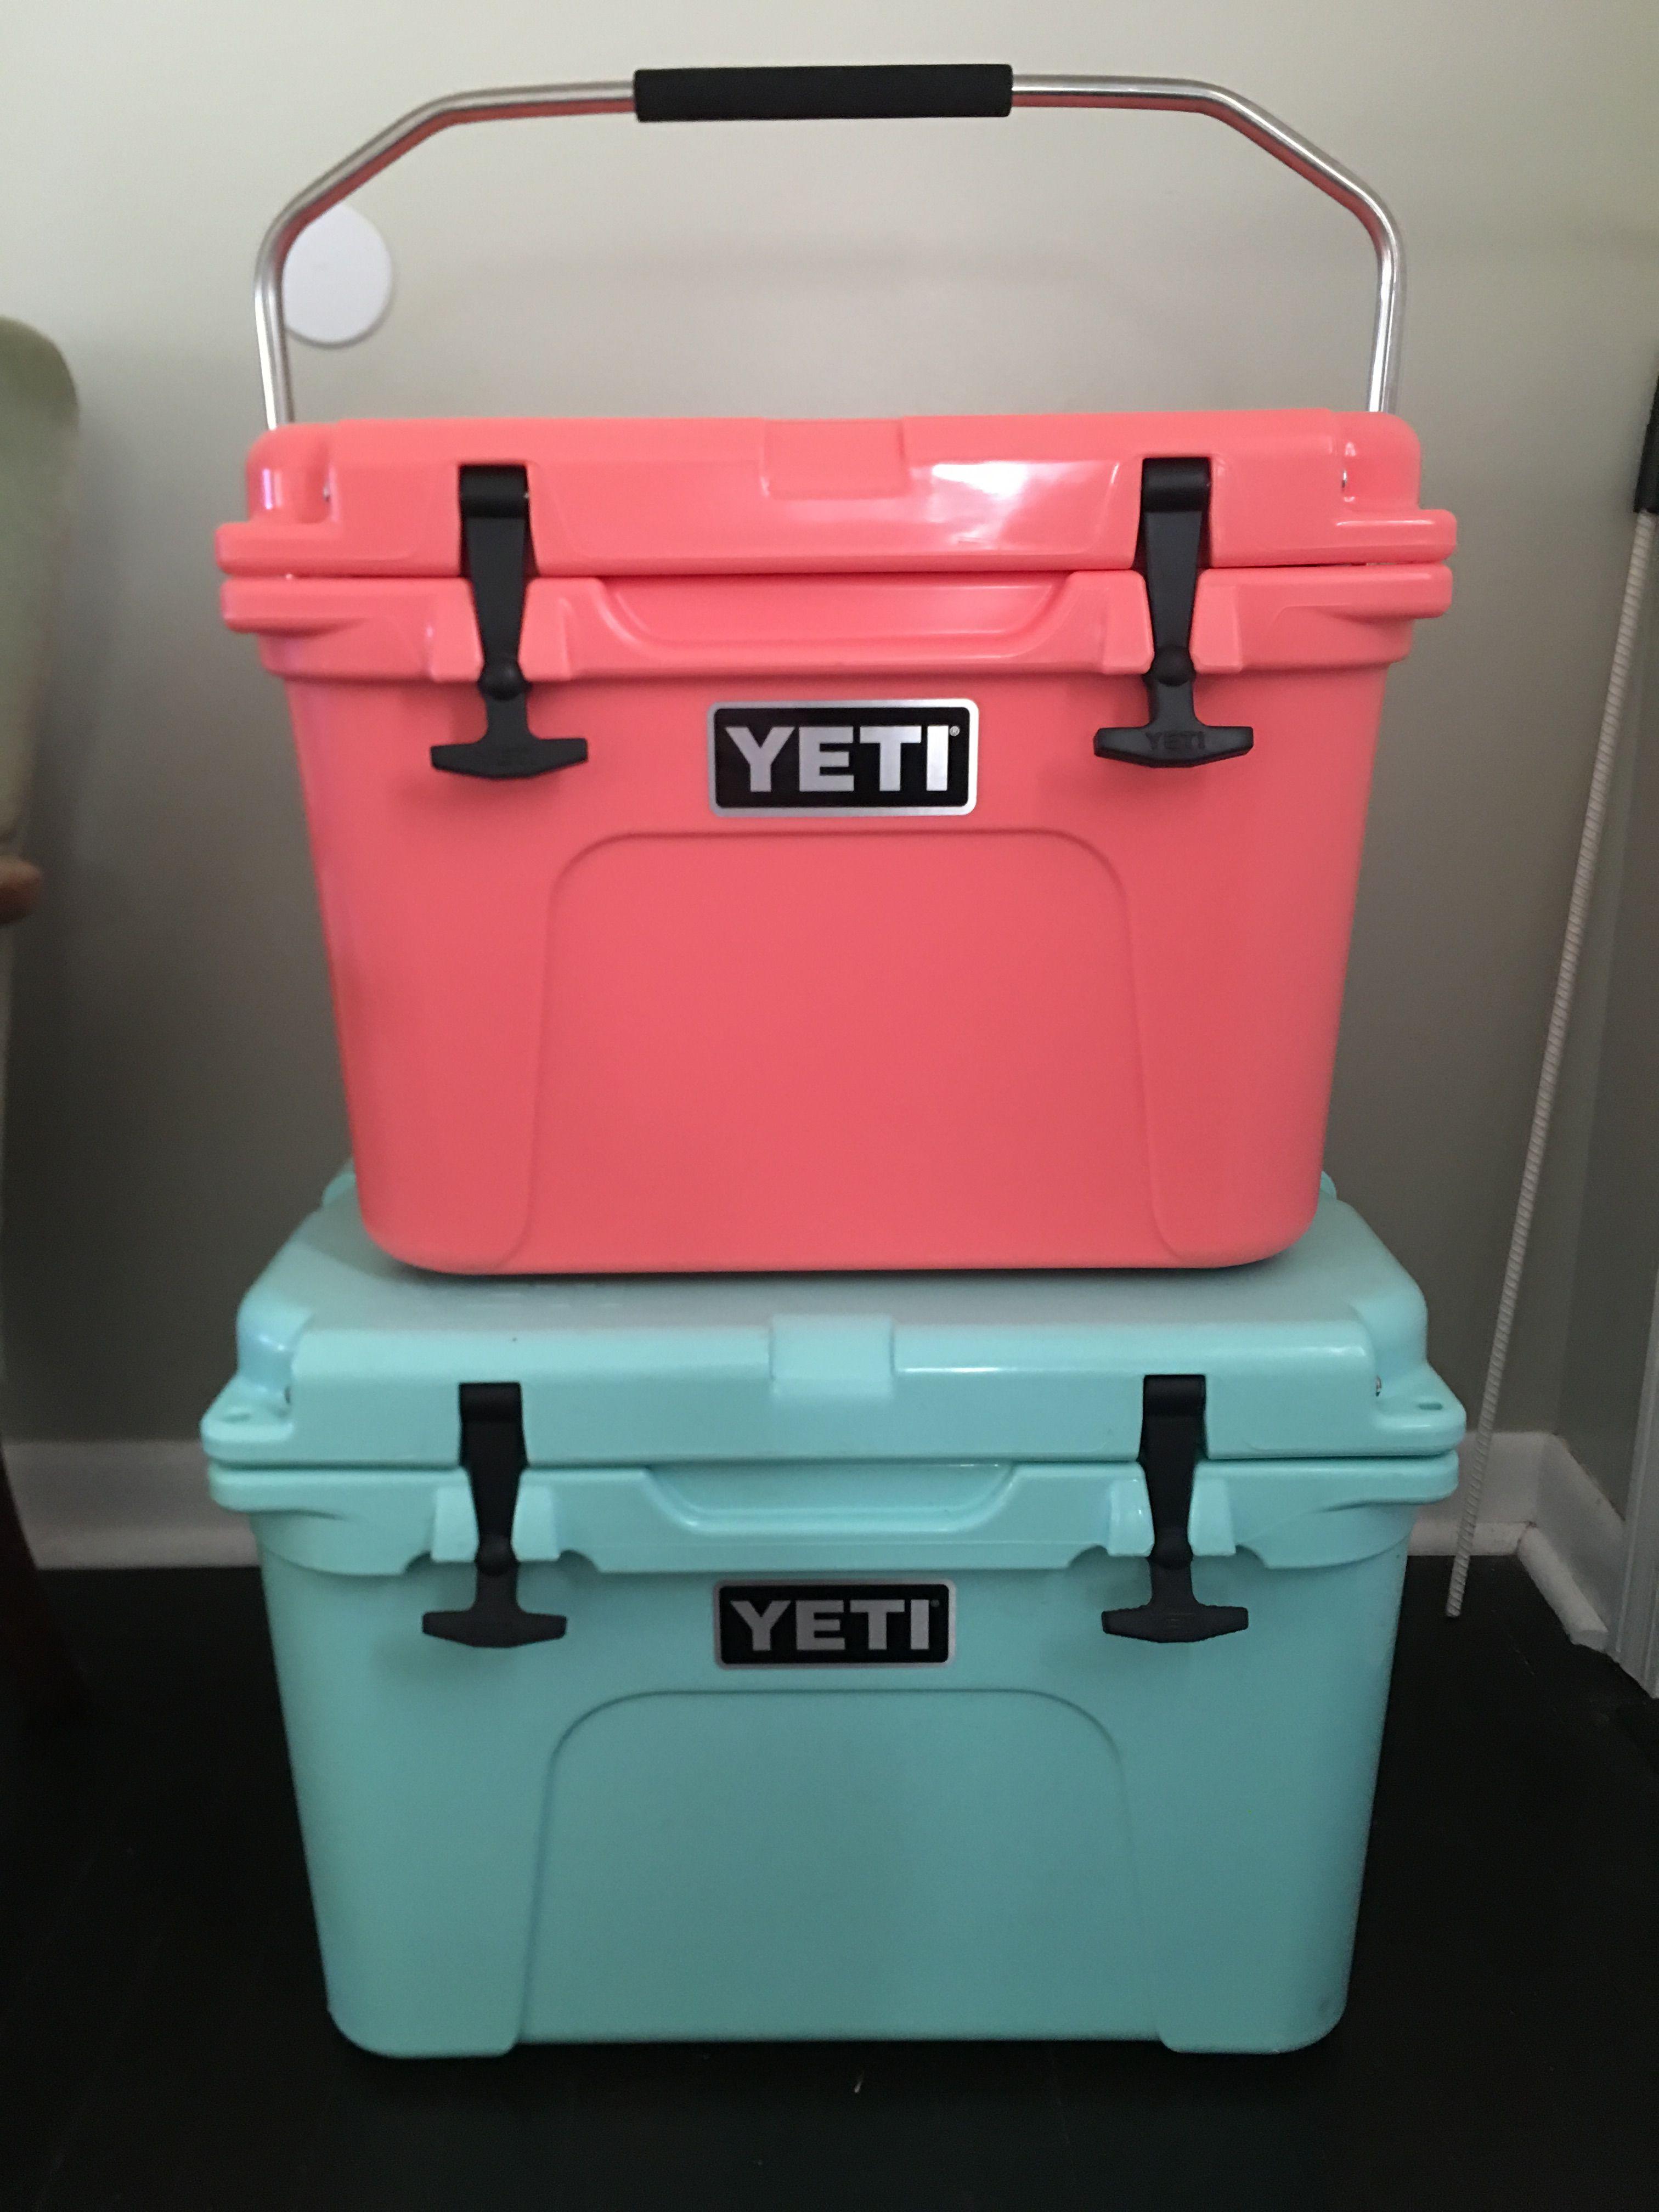 Yeti Coolers Coral And Sea Foam Yeti Cooler Yeti Coolers Yeti